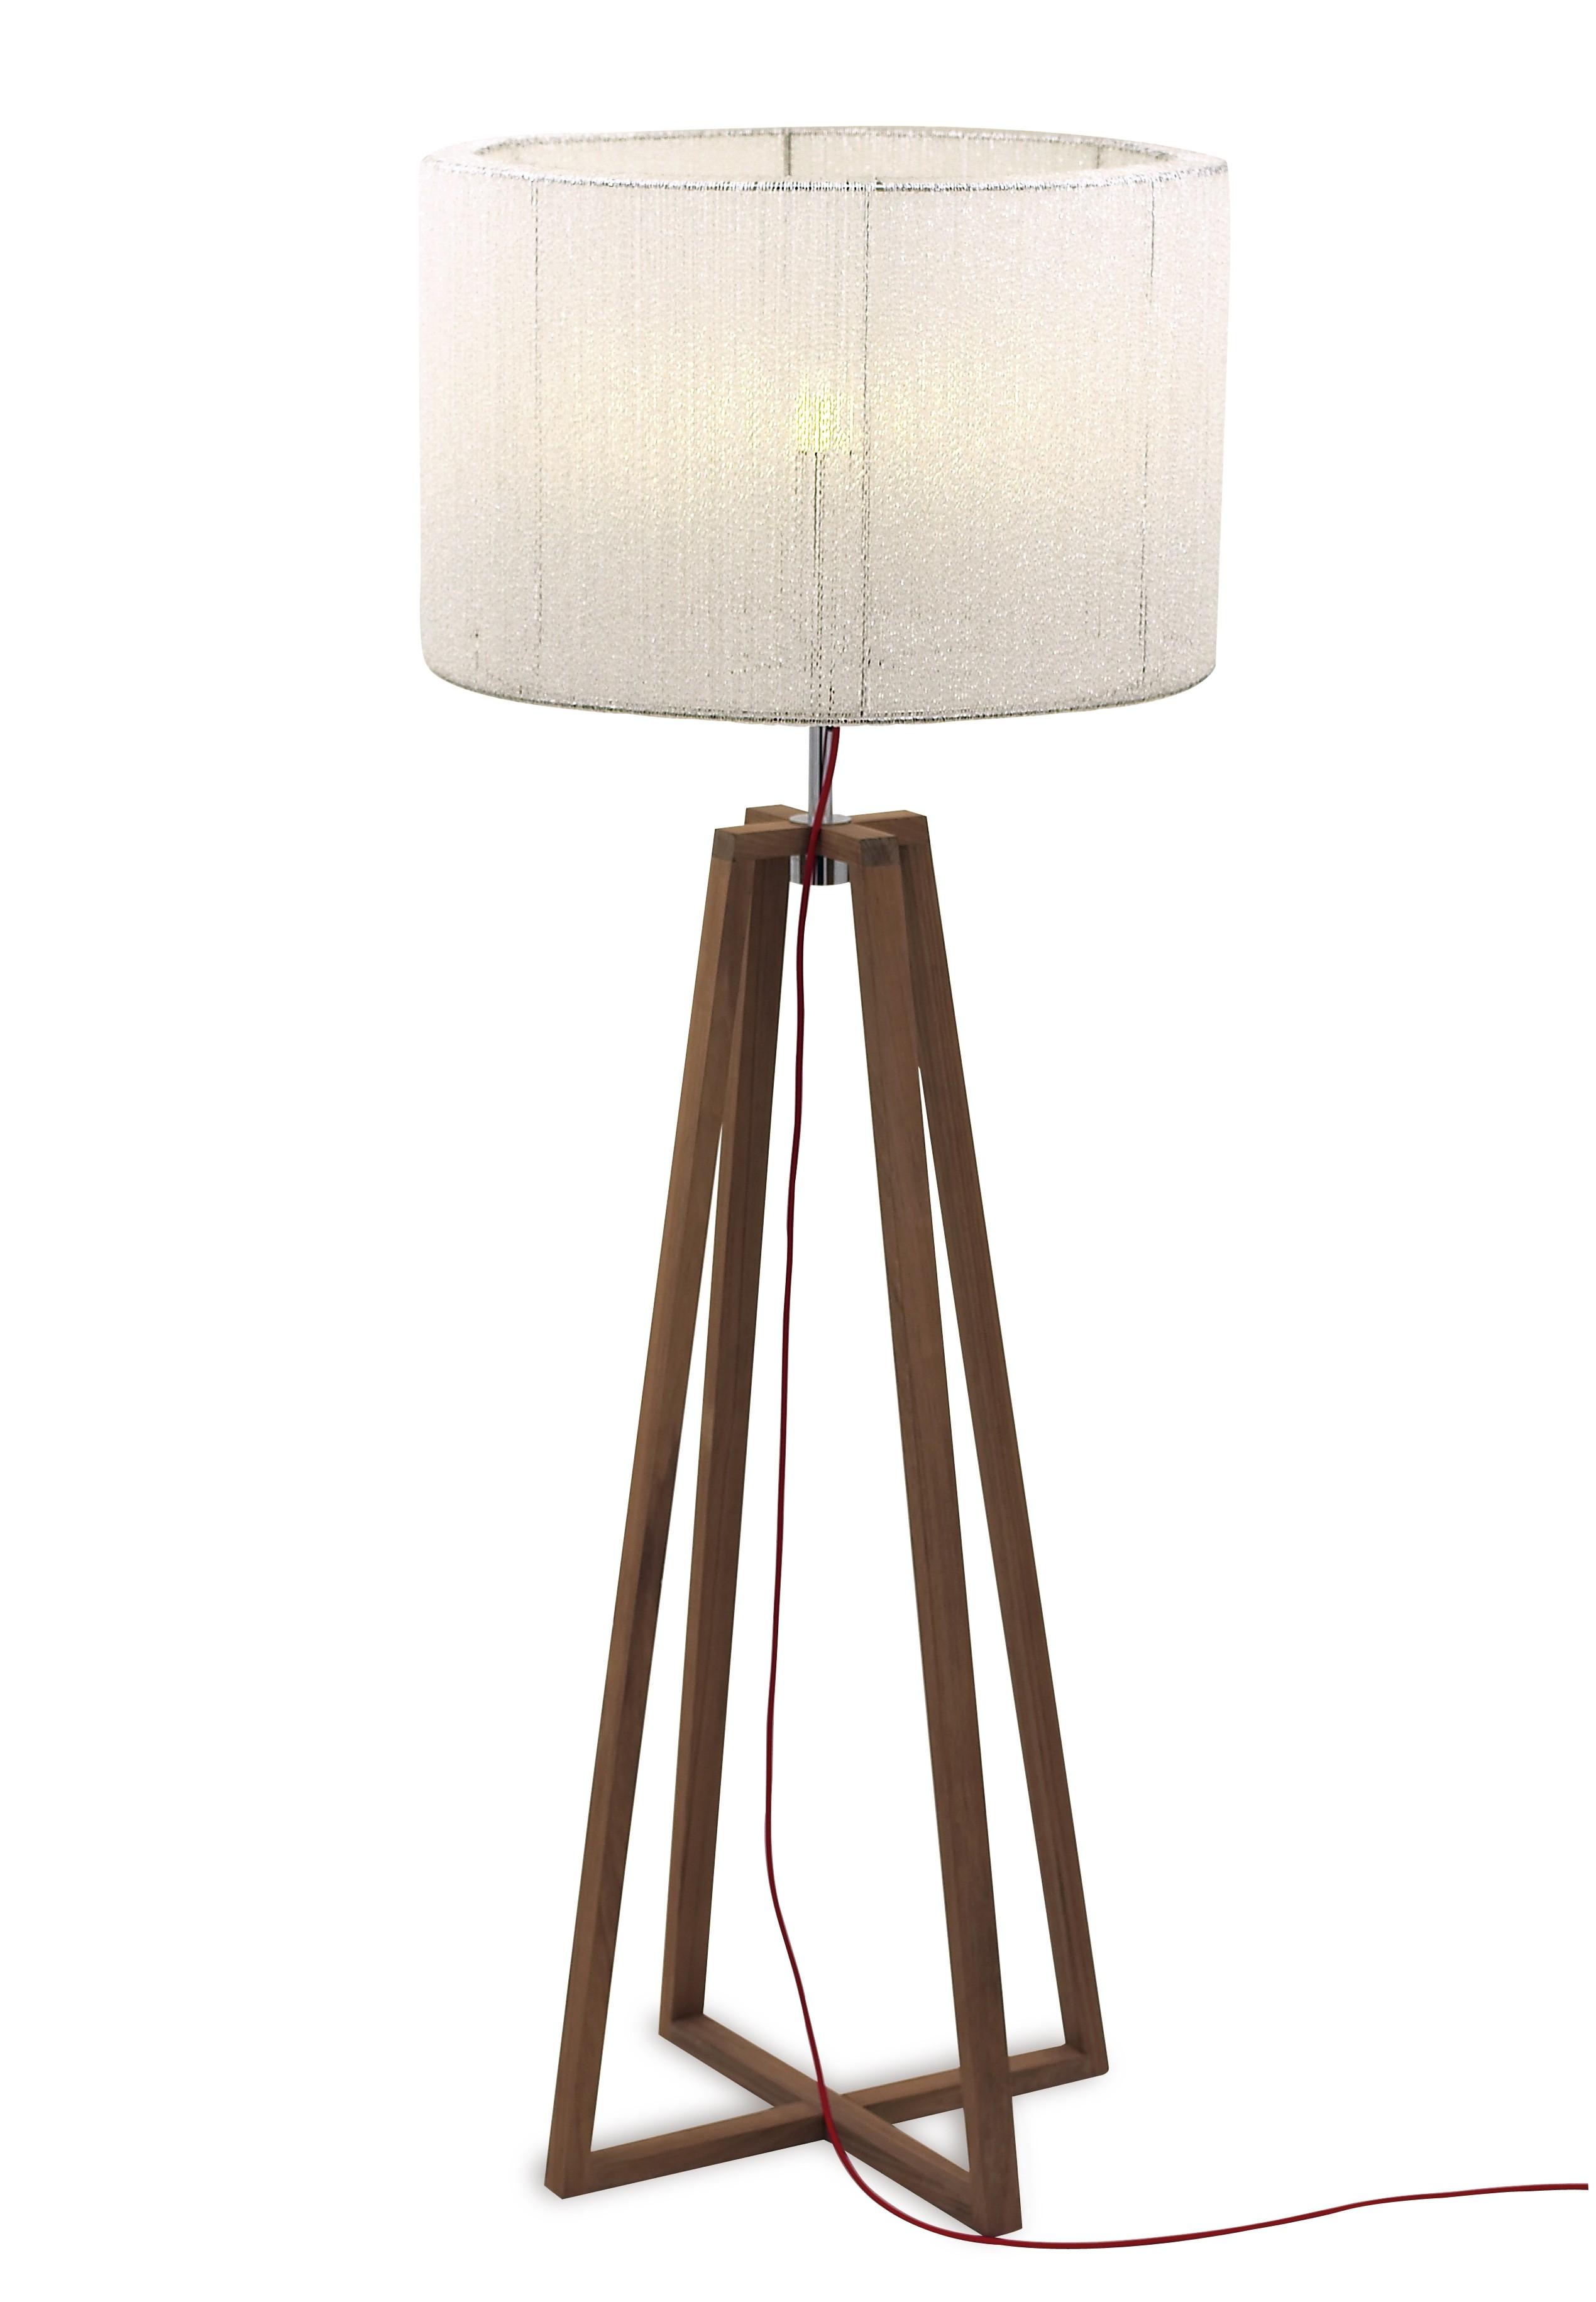 lampe club outdoor de royal botania. Black Bedroom Furniture Sets. Home Design Ideas